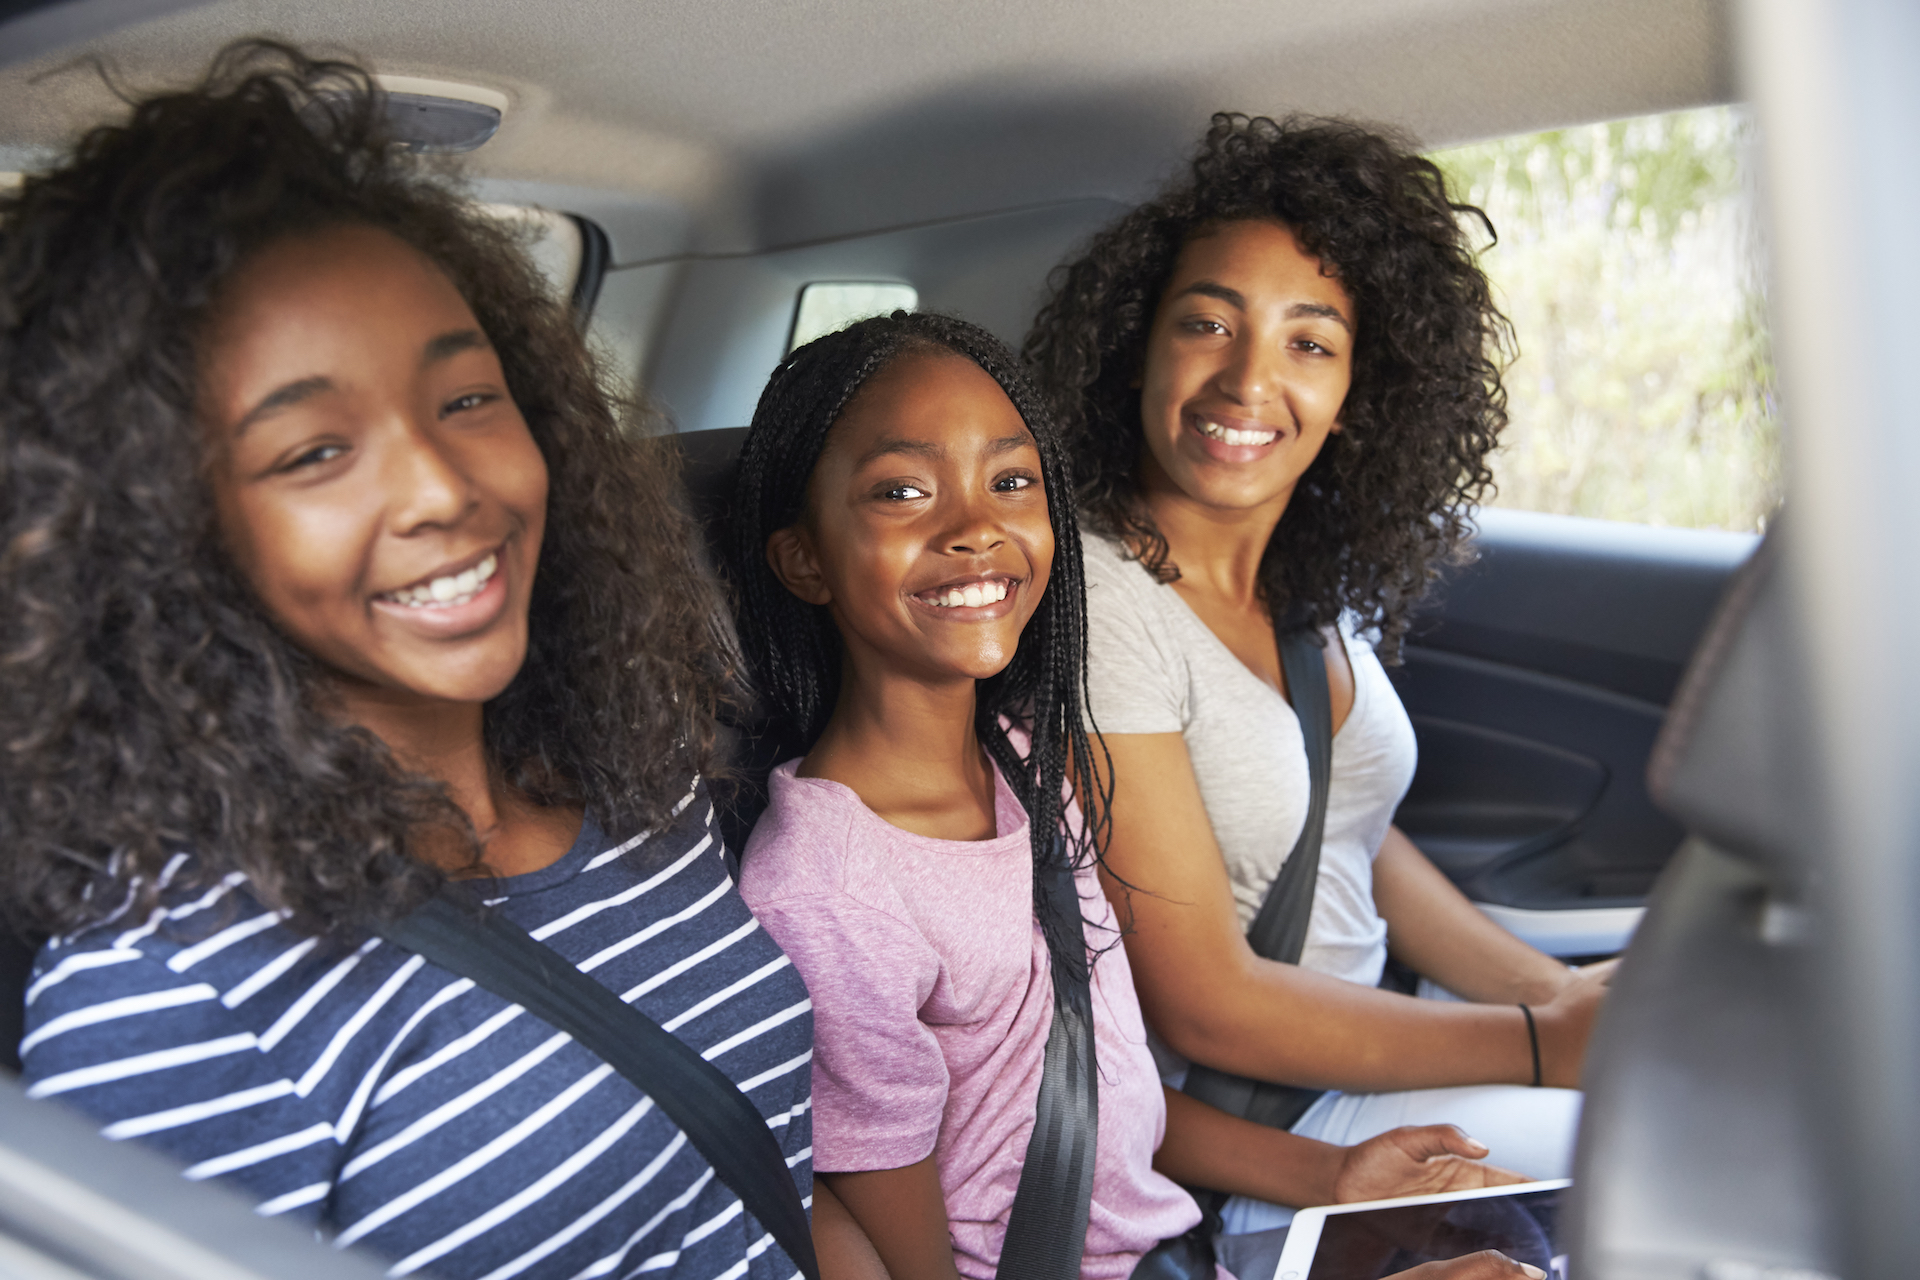 portrait-of-family-with-teenage-children-in-car-PZ2U9WC.jpg